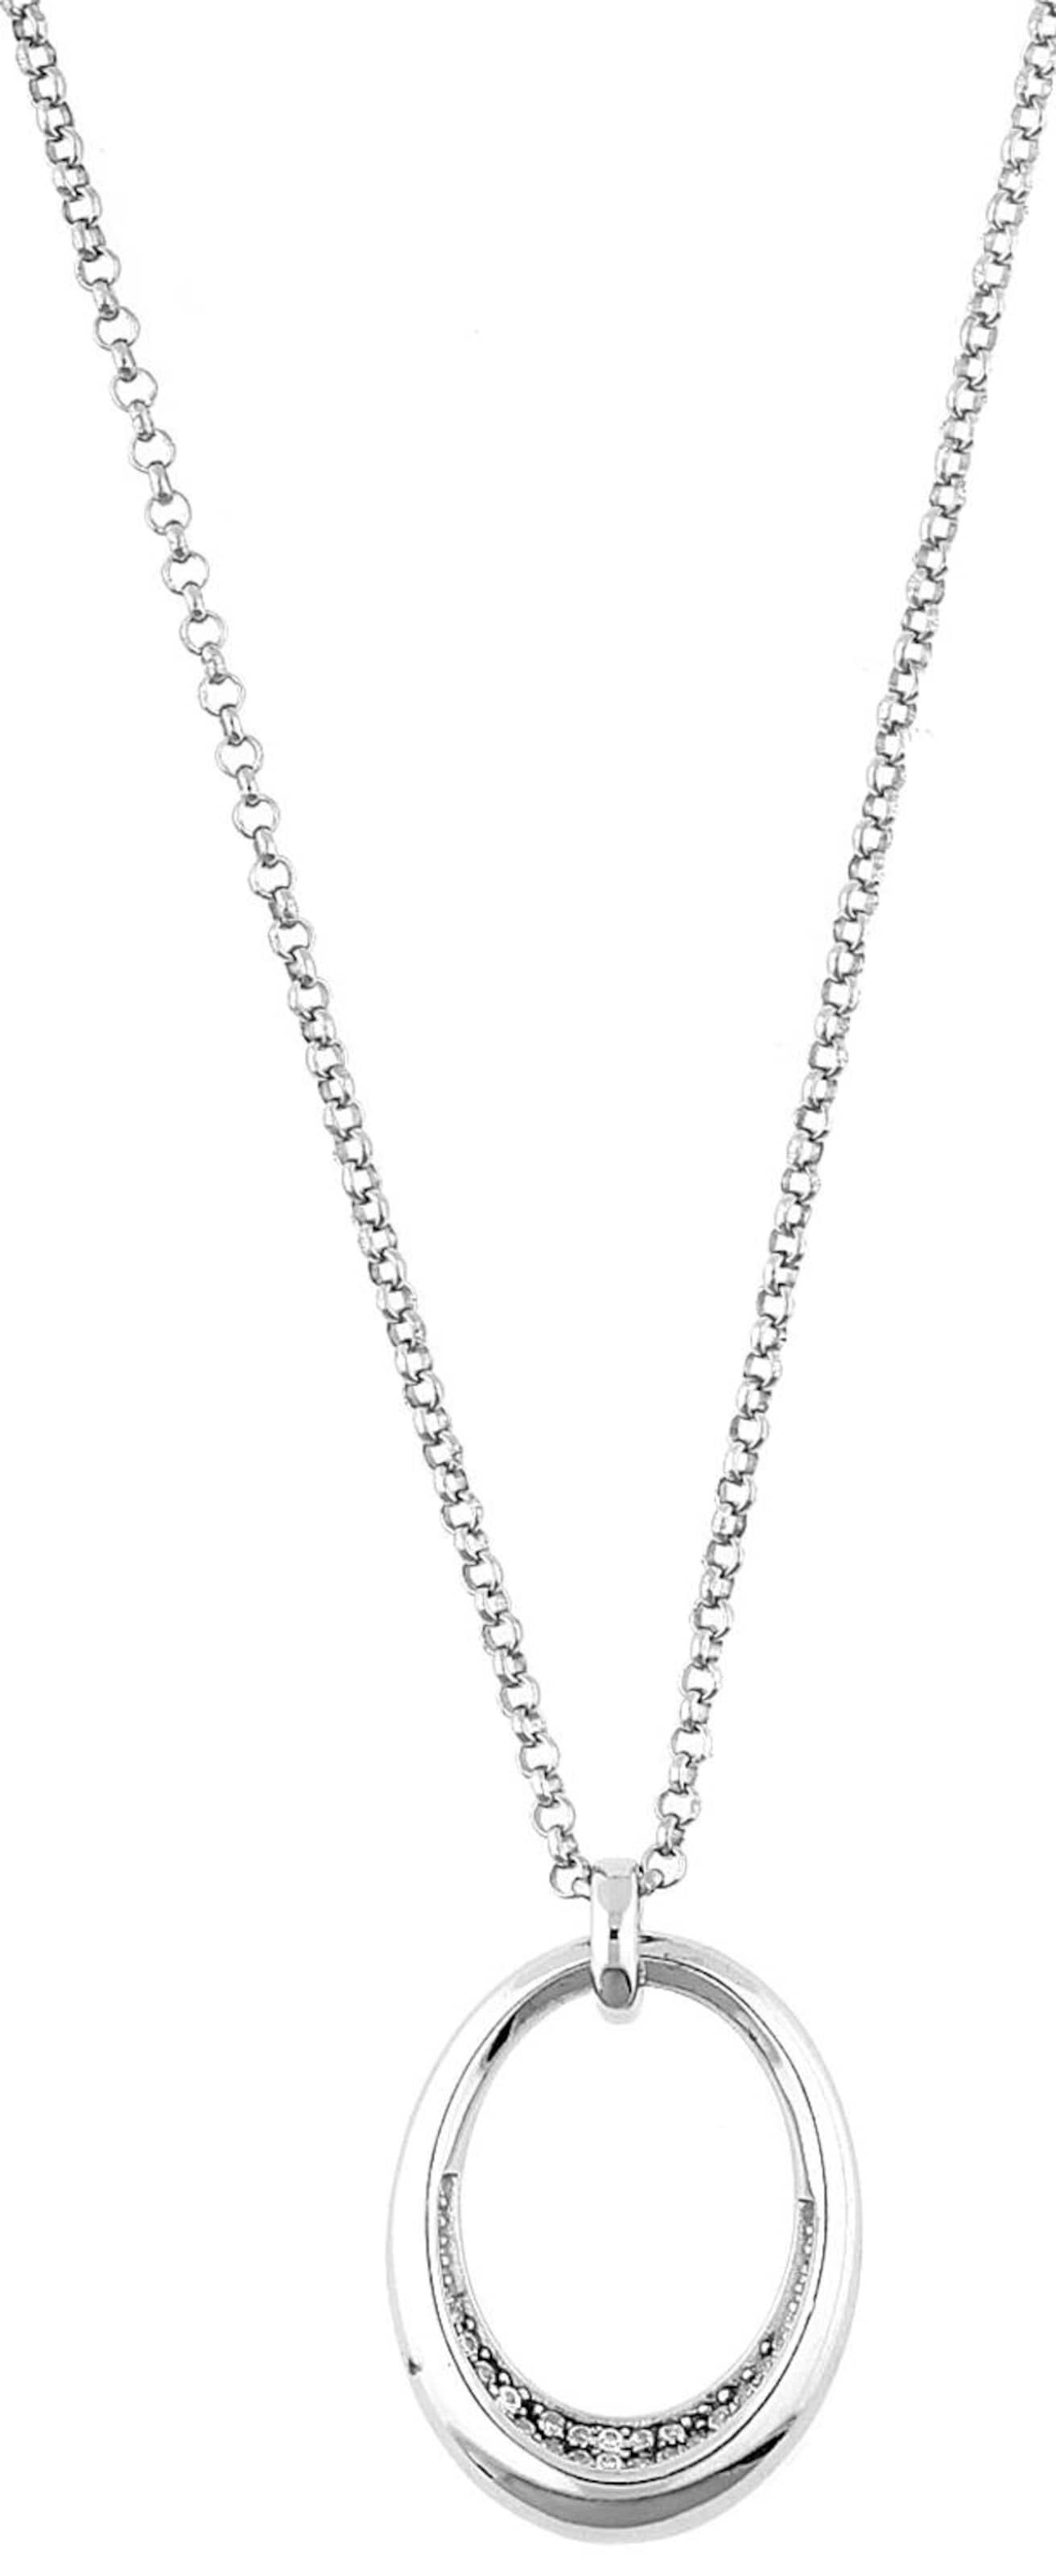 ESPRIT Silberkette 'Ovality' Finden Große Günstig Online Bilder Steckdose Truhe Factory-Outlet-Online Visa-Zahlung Verkauf Online Q18DWbv